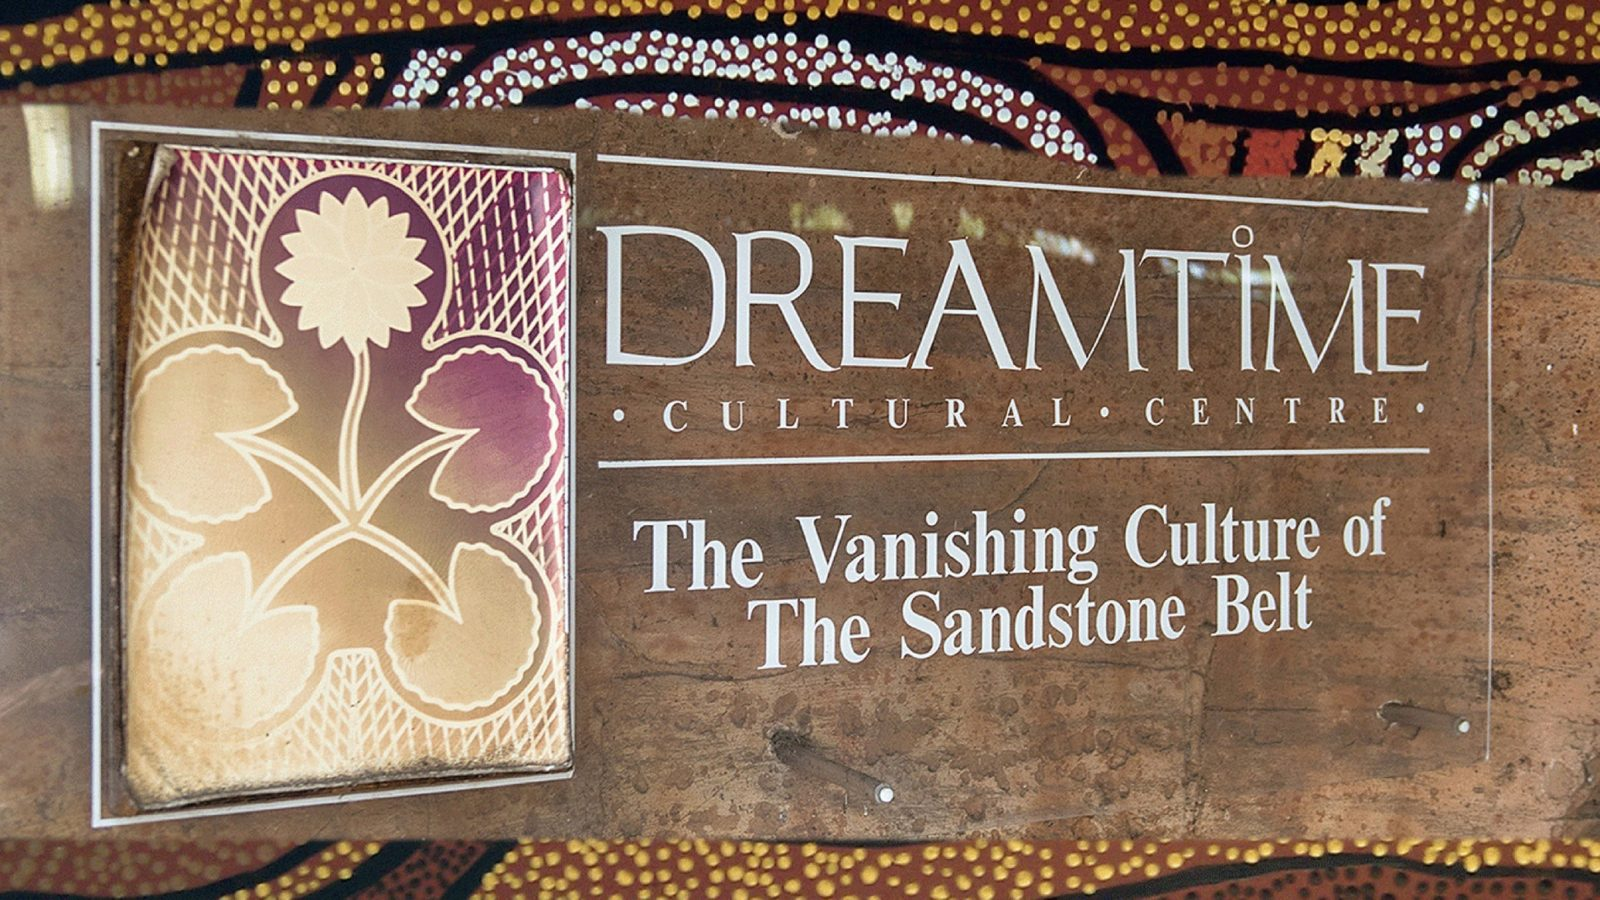 Dreamtime Cultural Centre